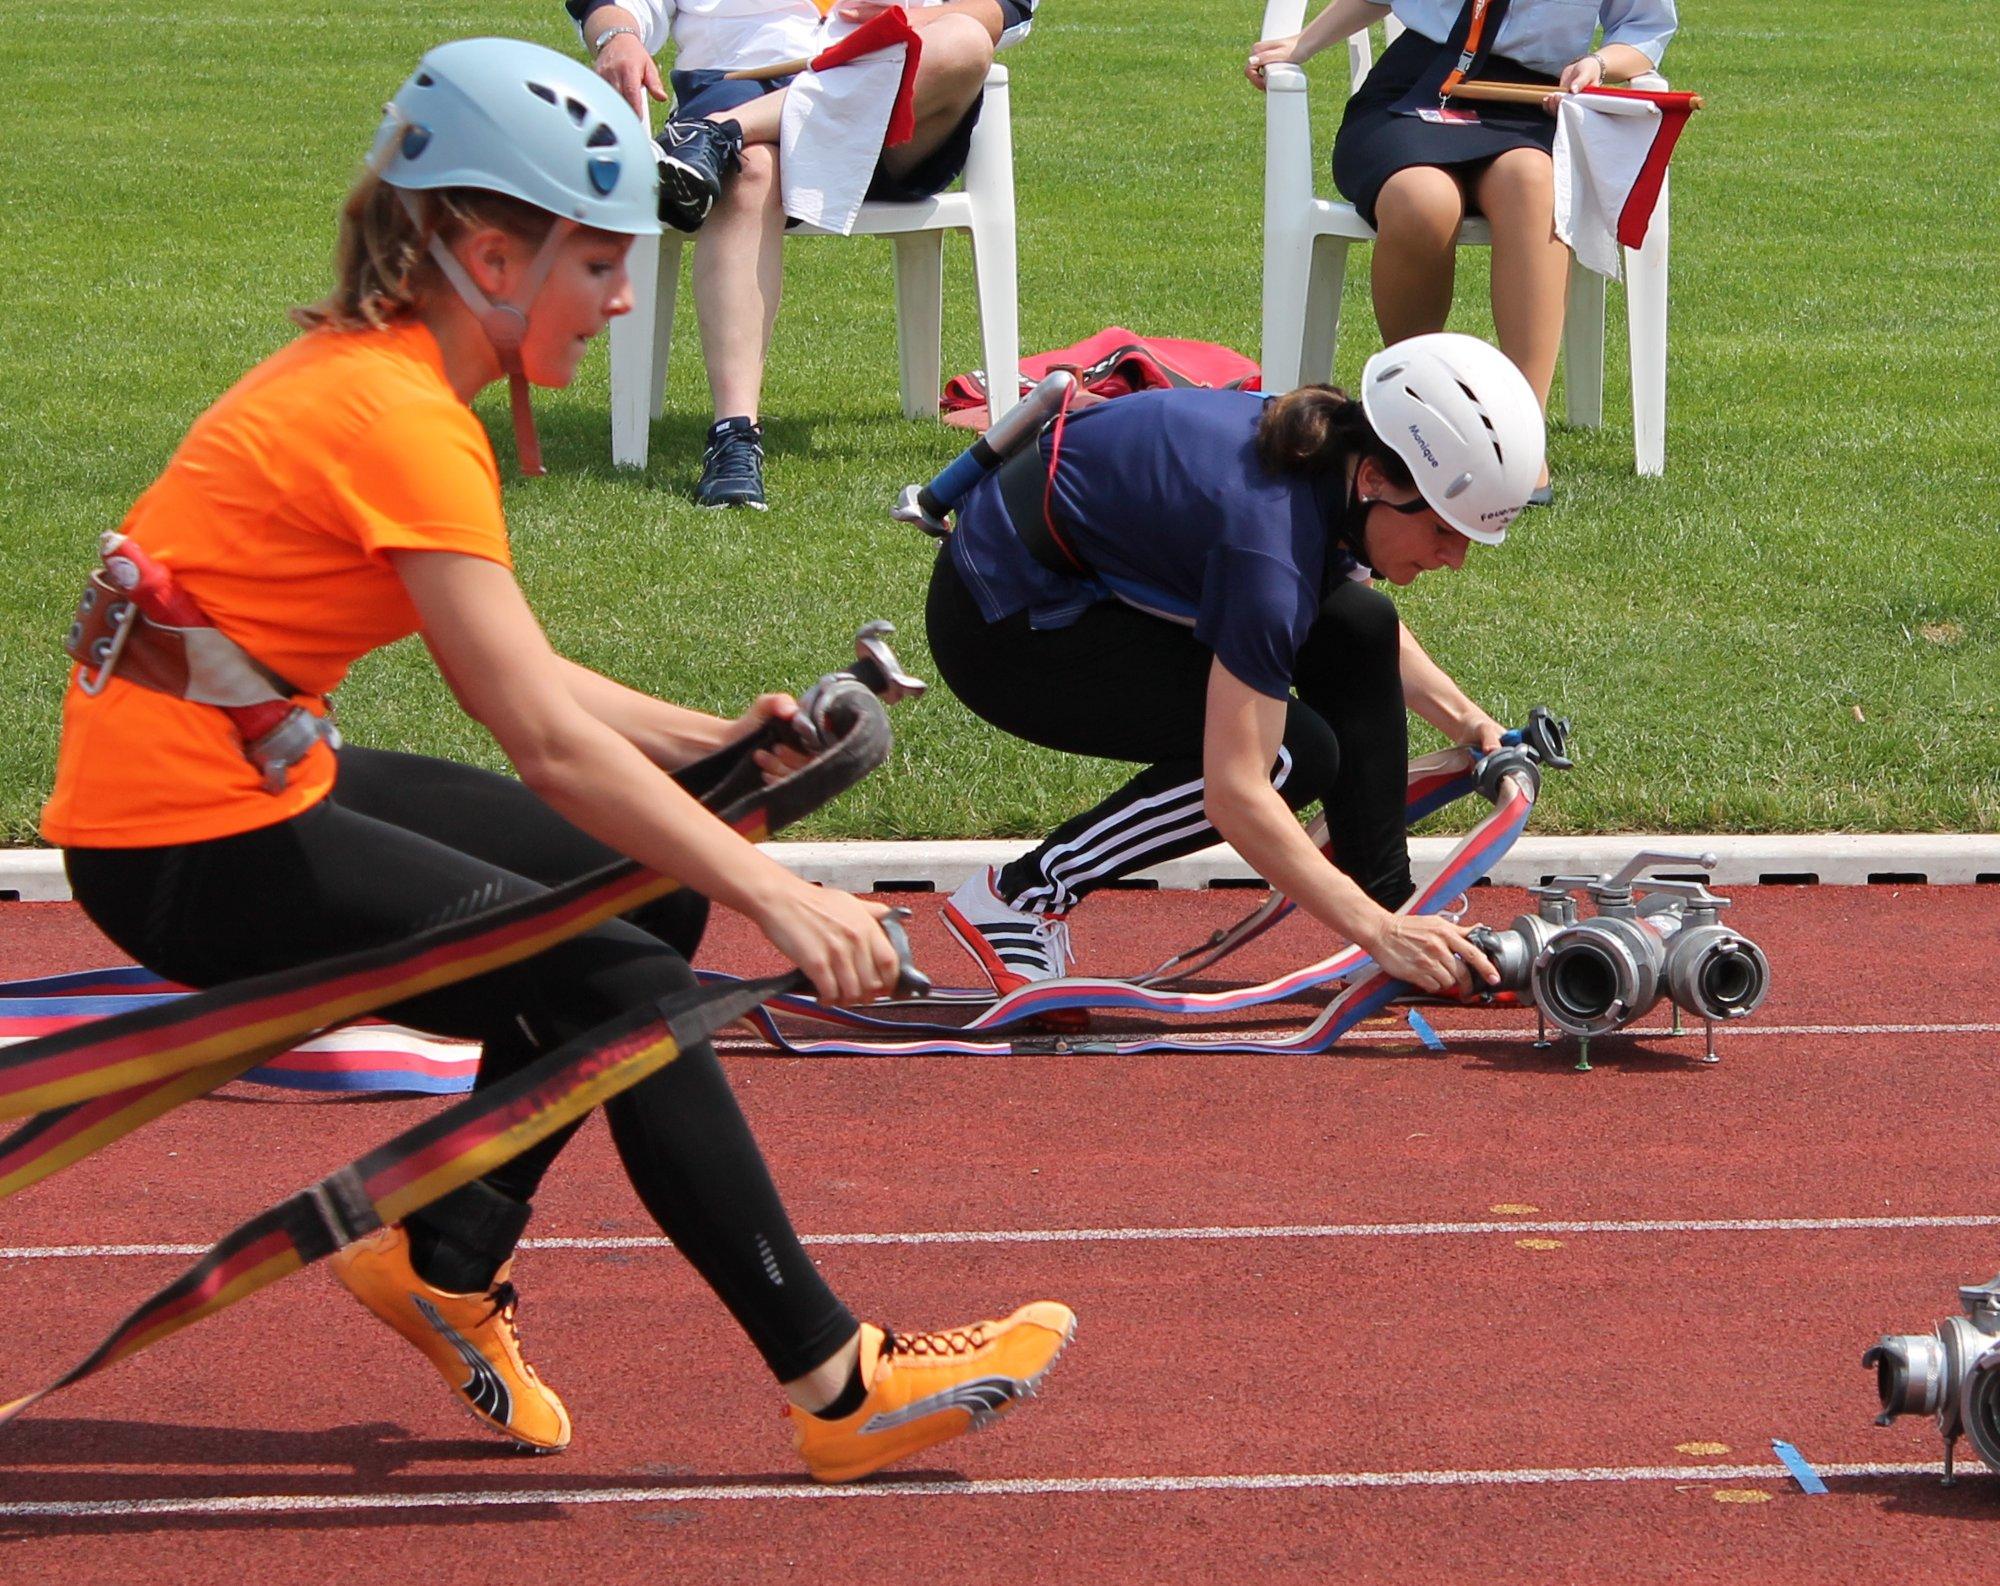 100m-Hindernisbahn Zeulenroda 2013